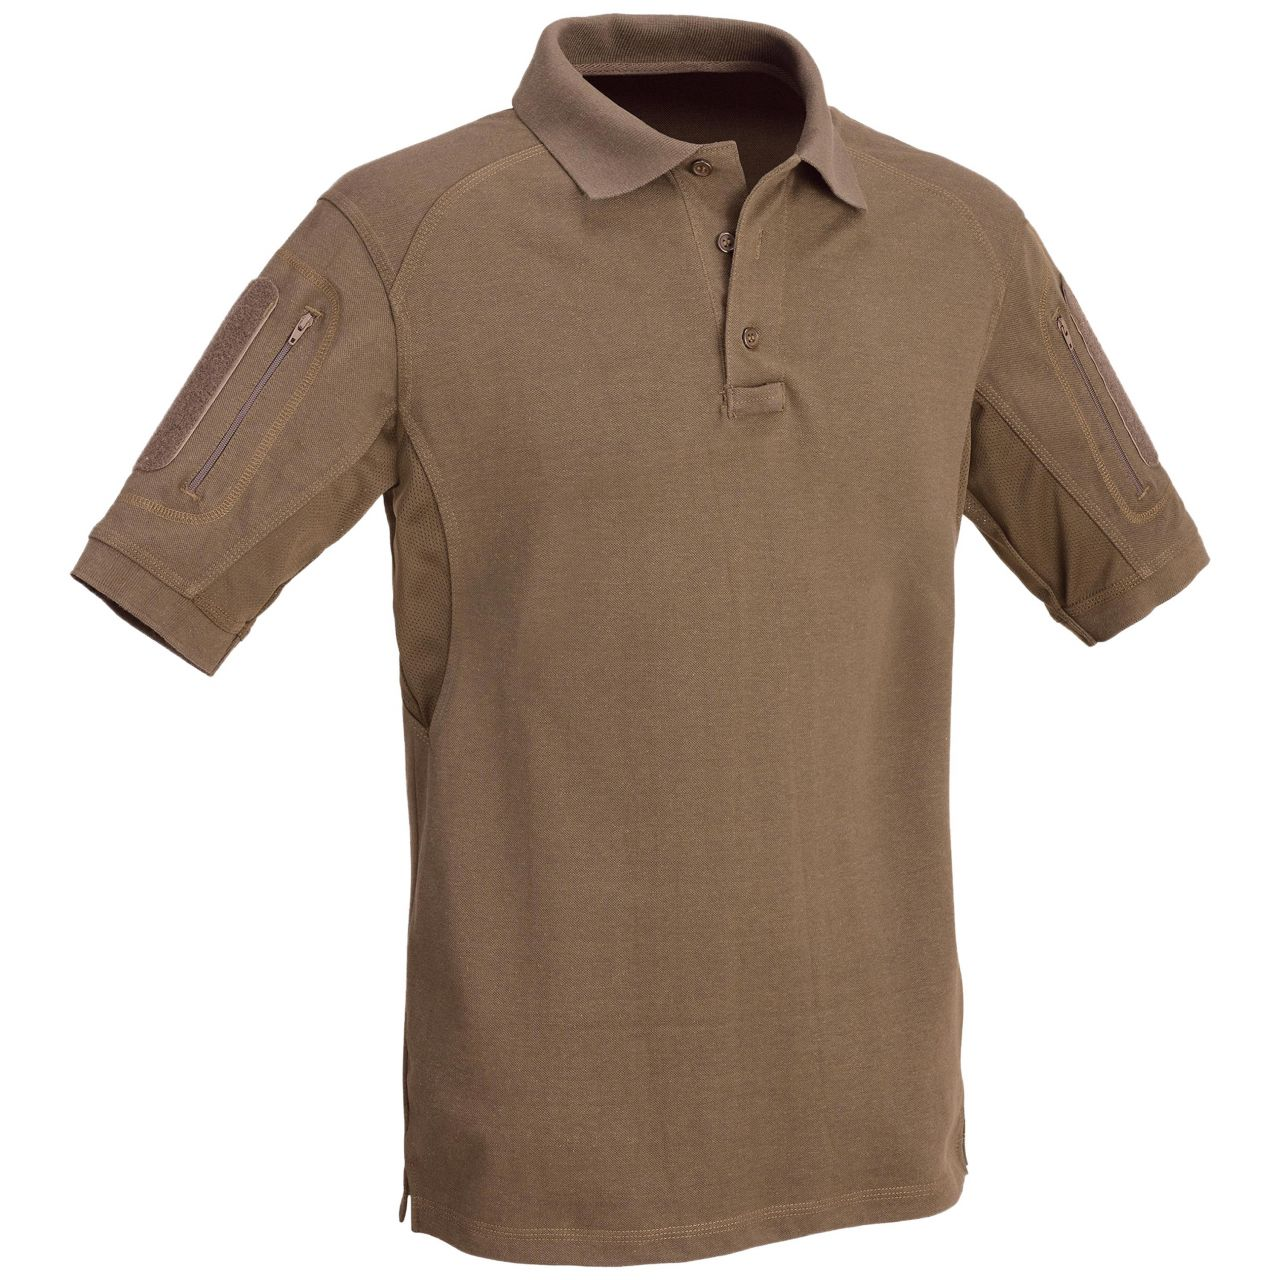 Camiseta Polo Defcon 5 Tactical coyote